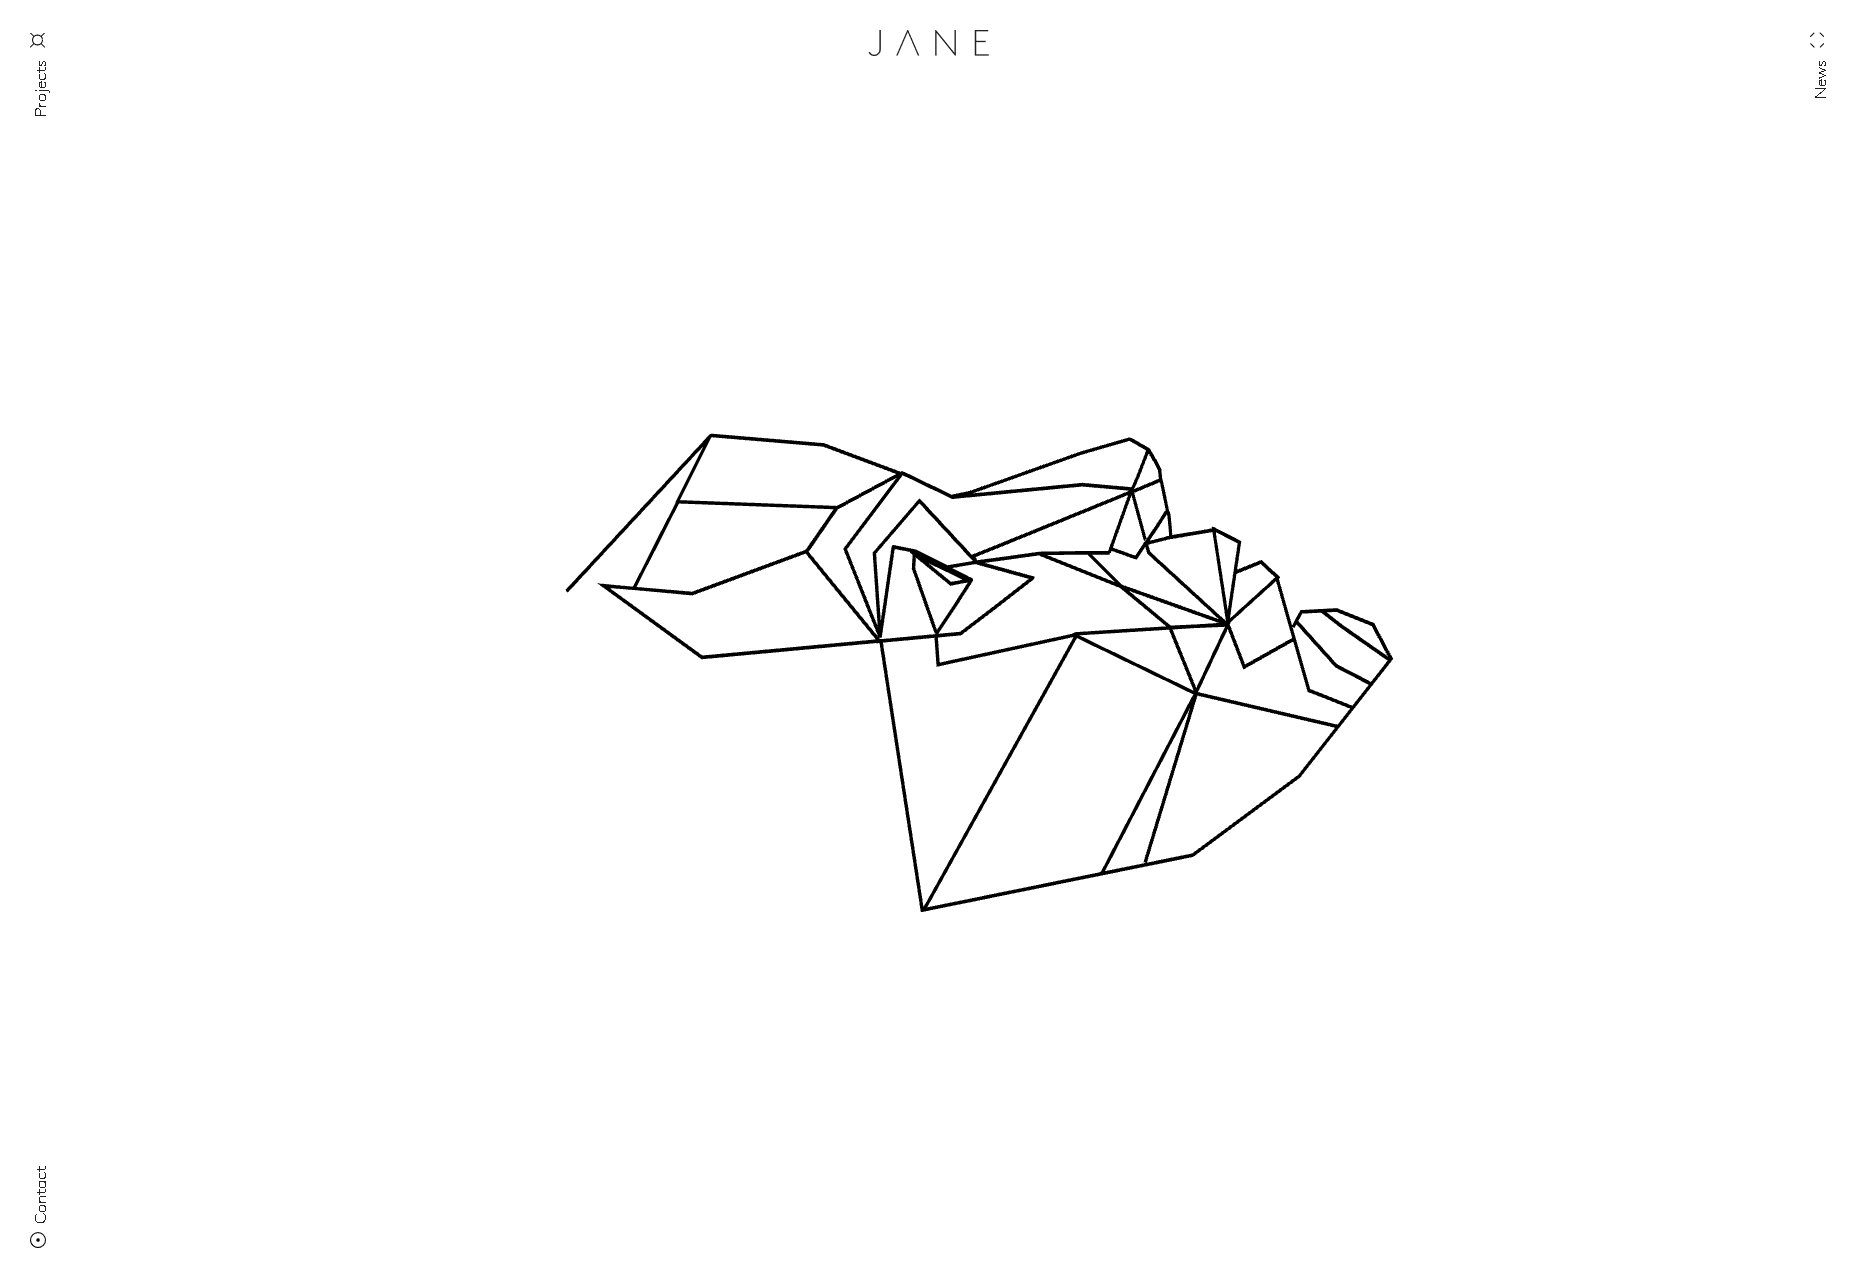 13 - Jane